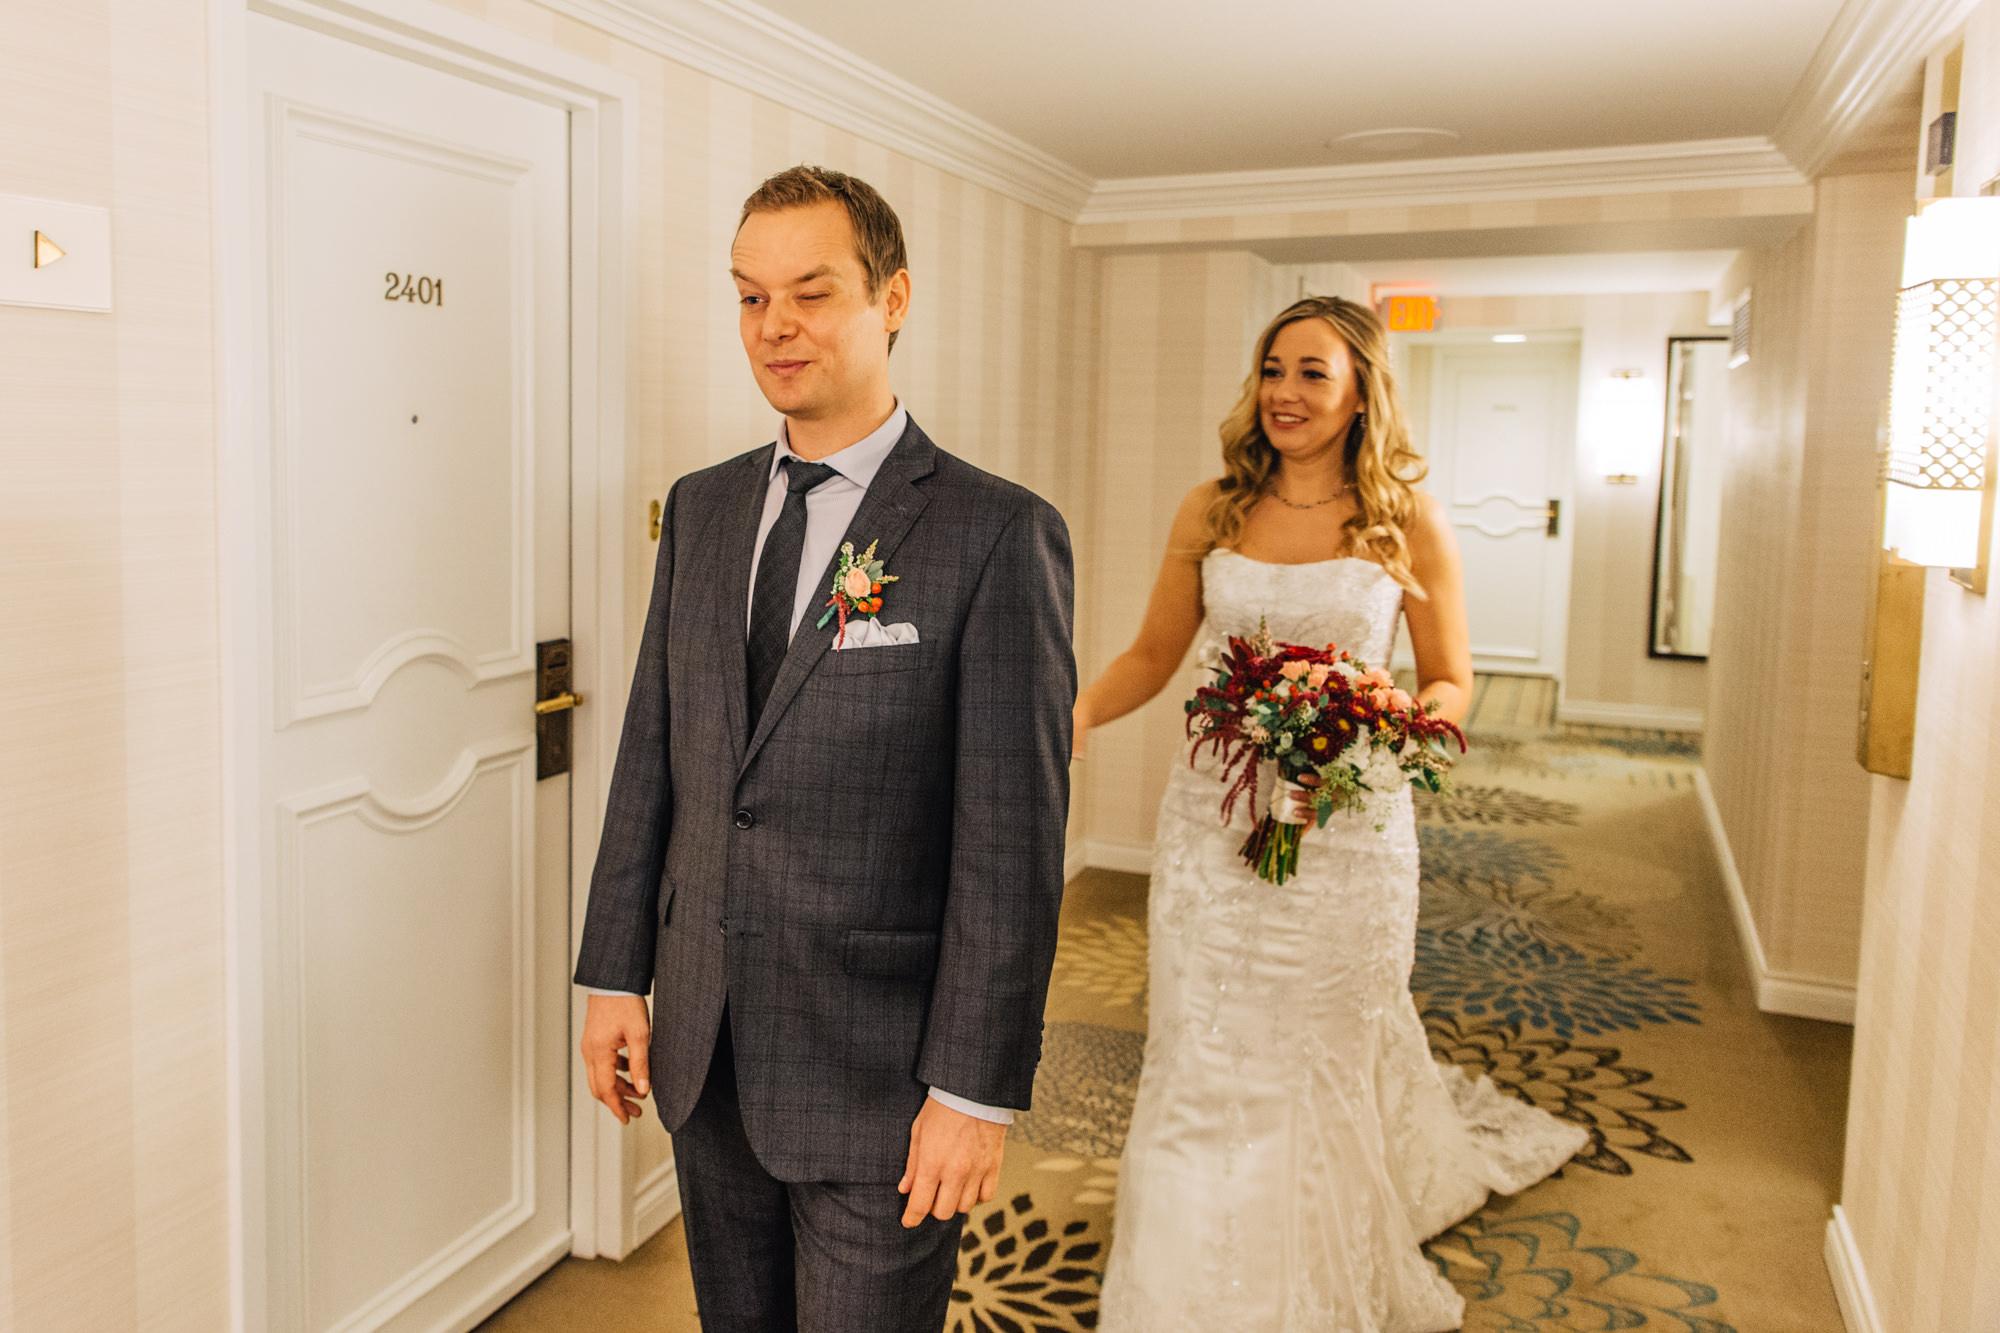 10-four-seasons-hotel-hallway-first-look.jpg